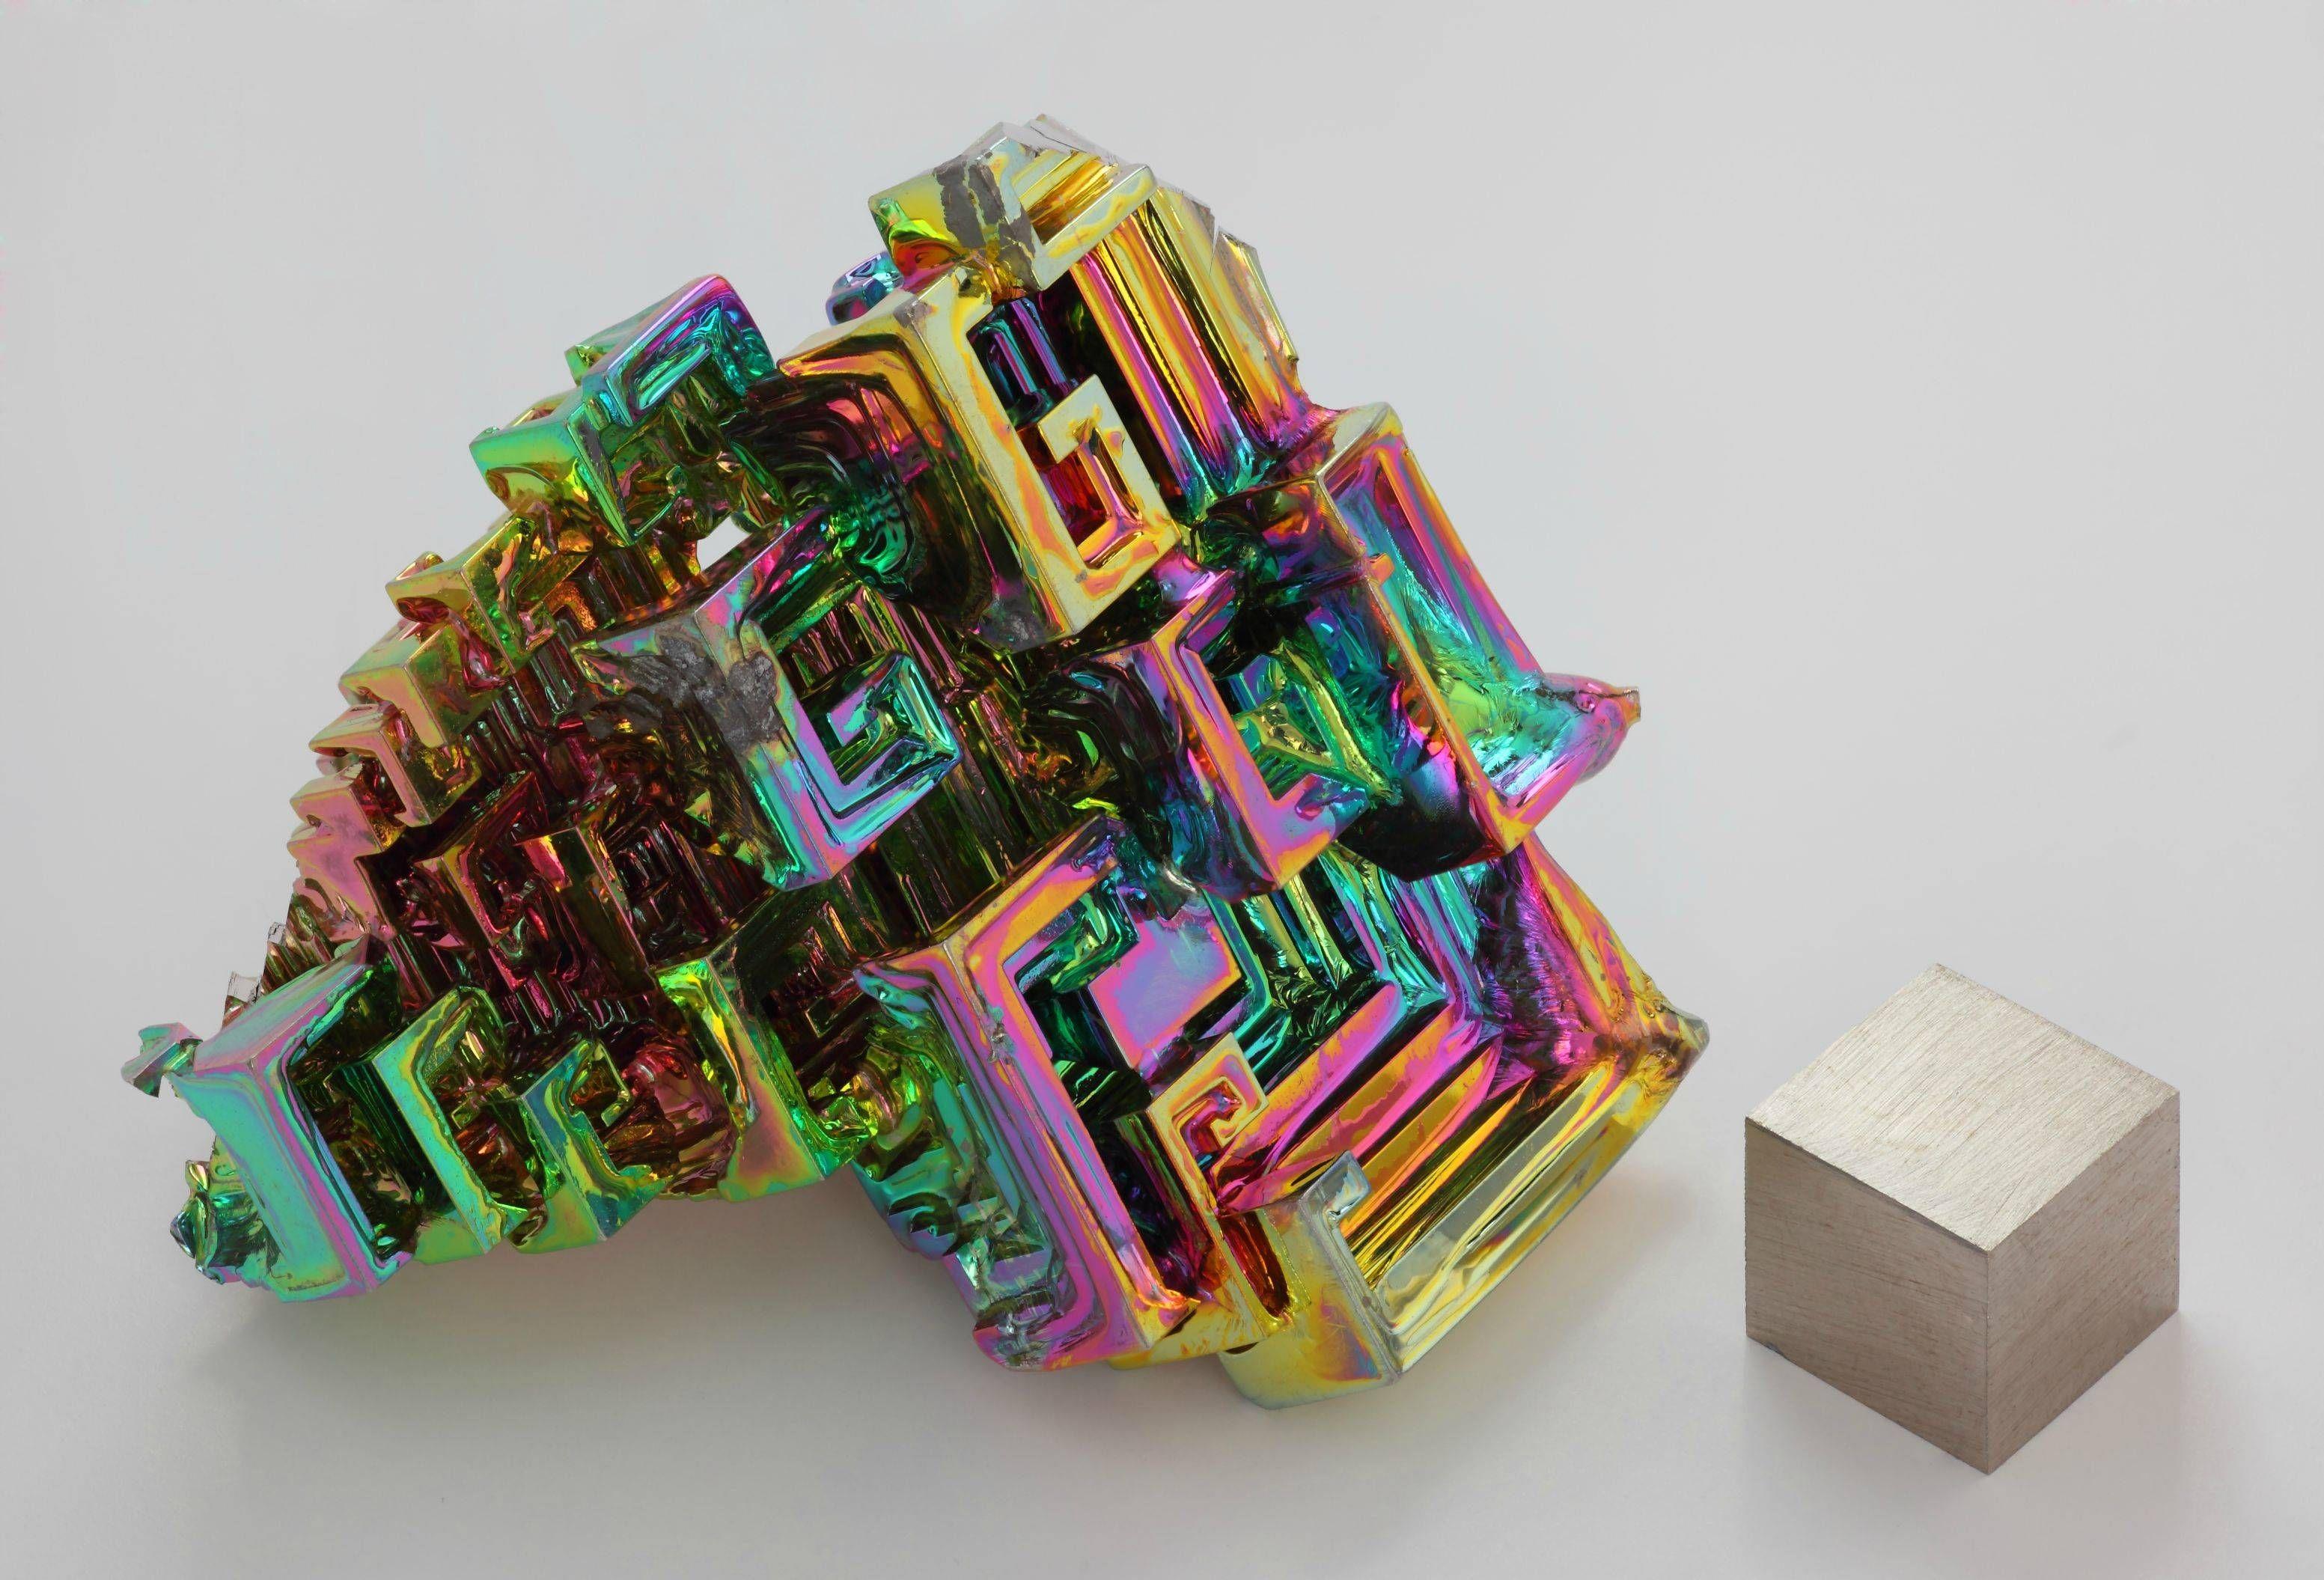 Cristal de bismuth